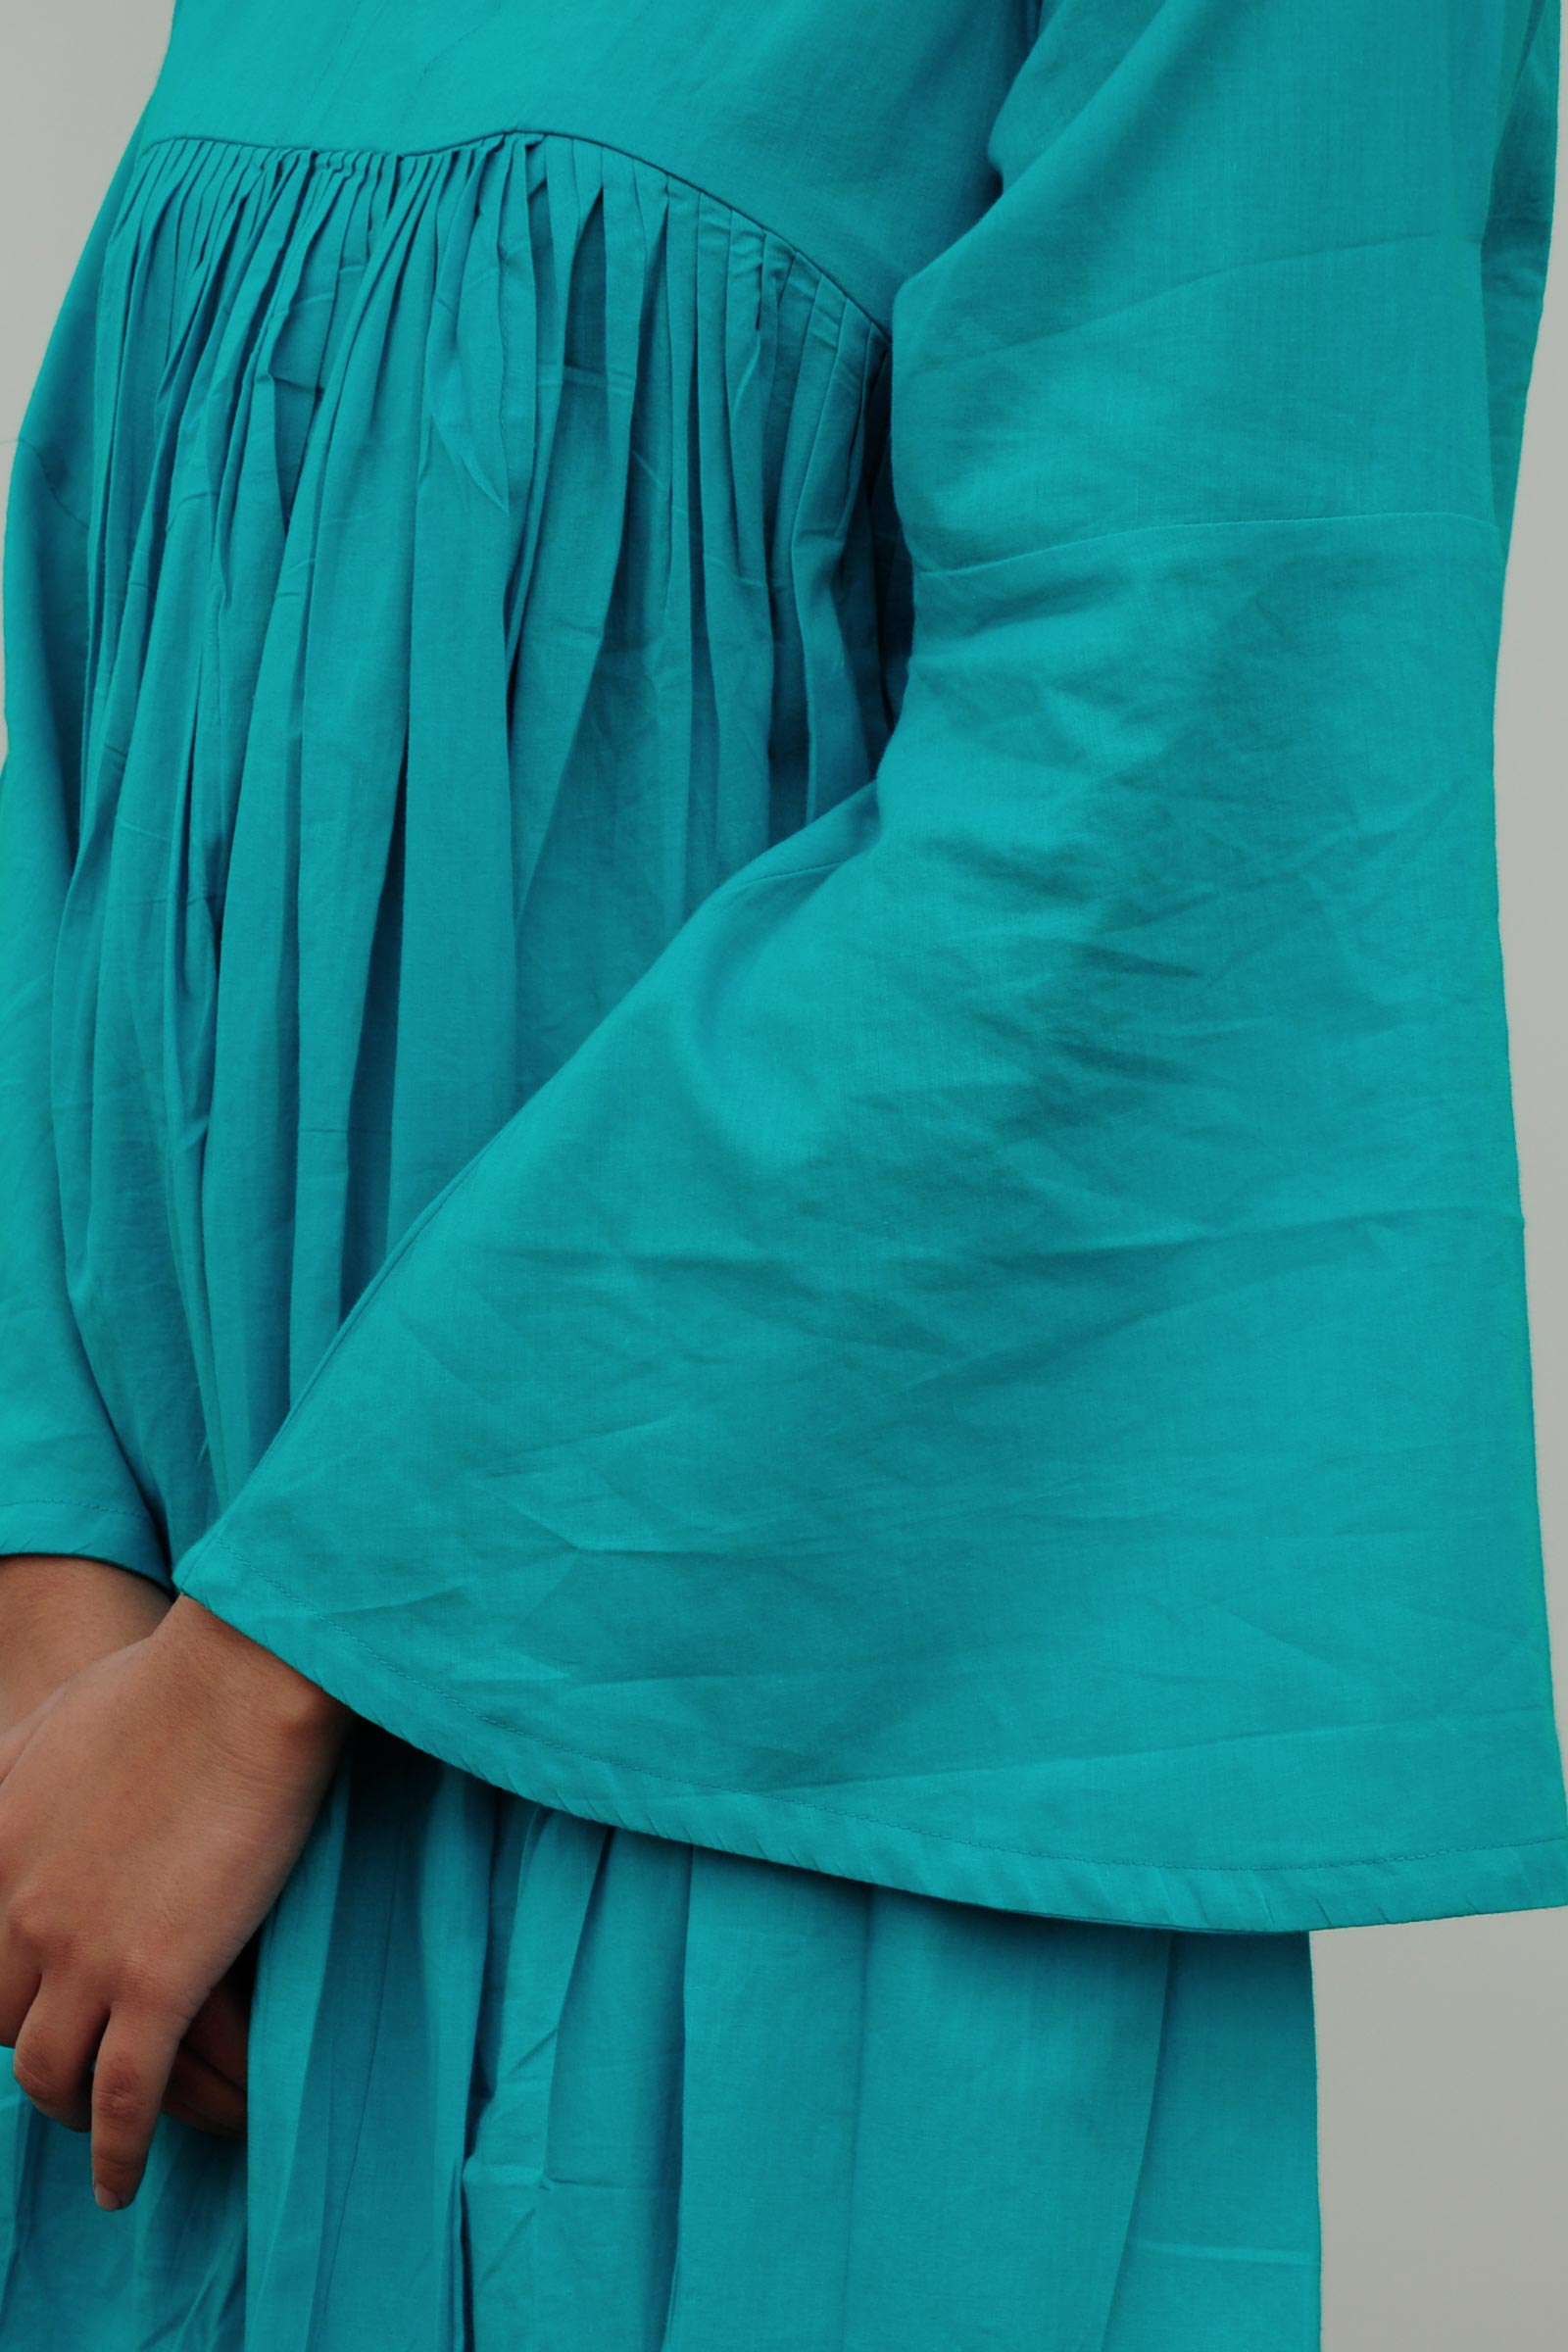 Pleated Turquoise Tunic